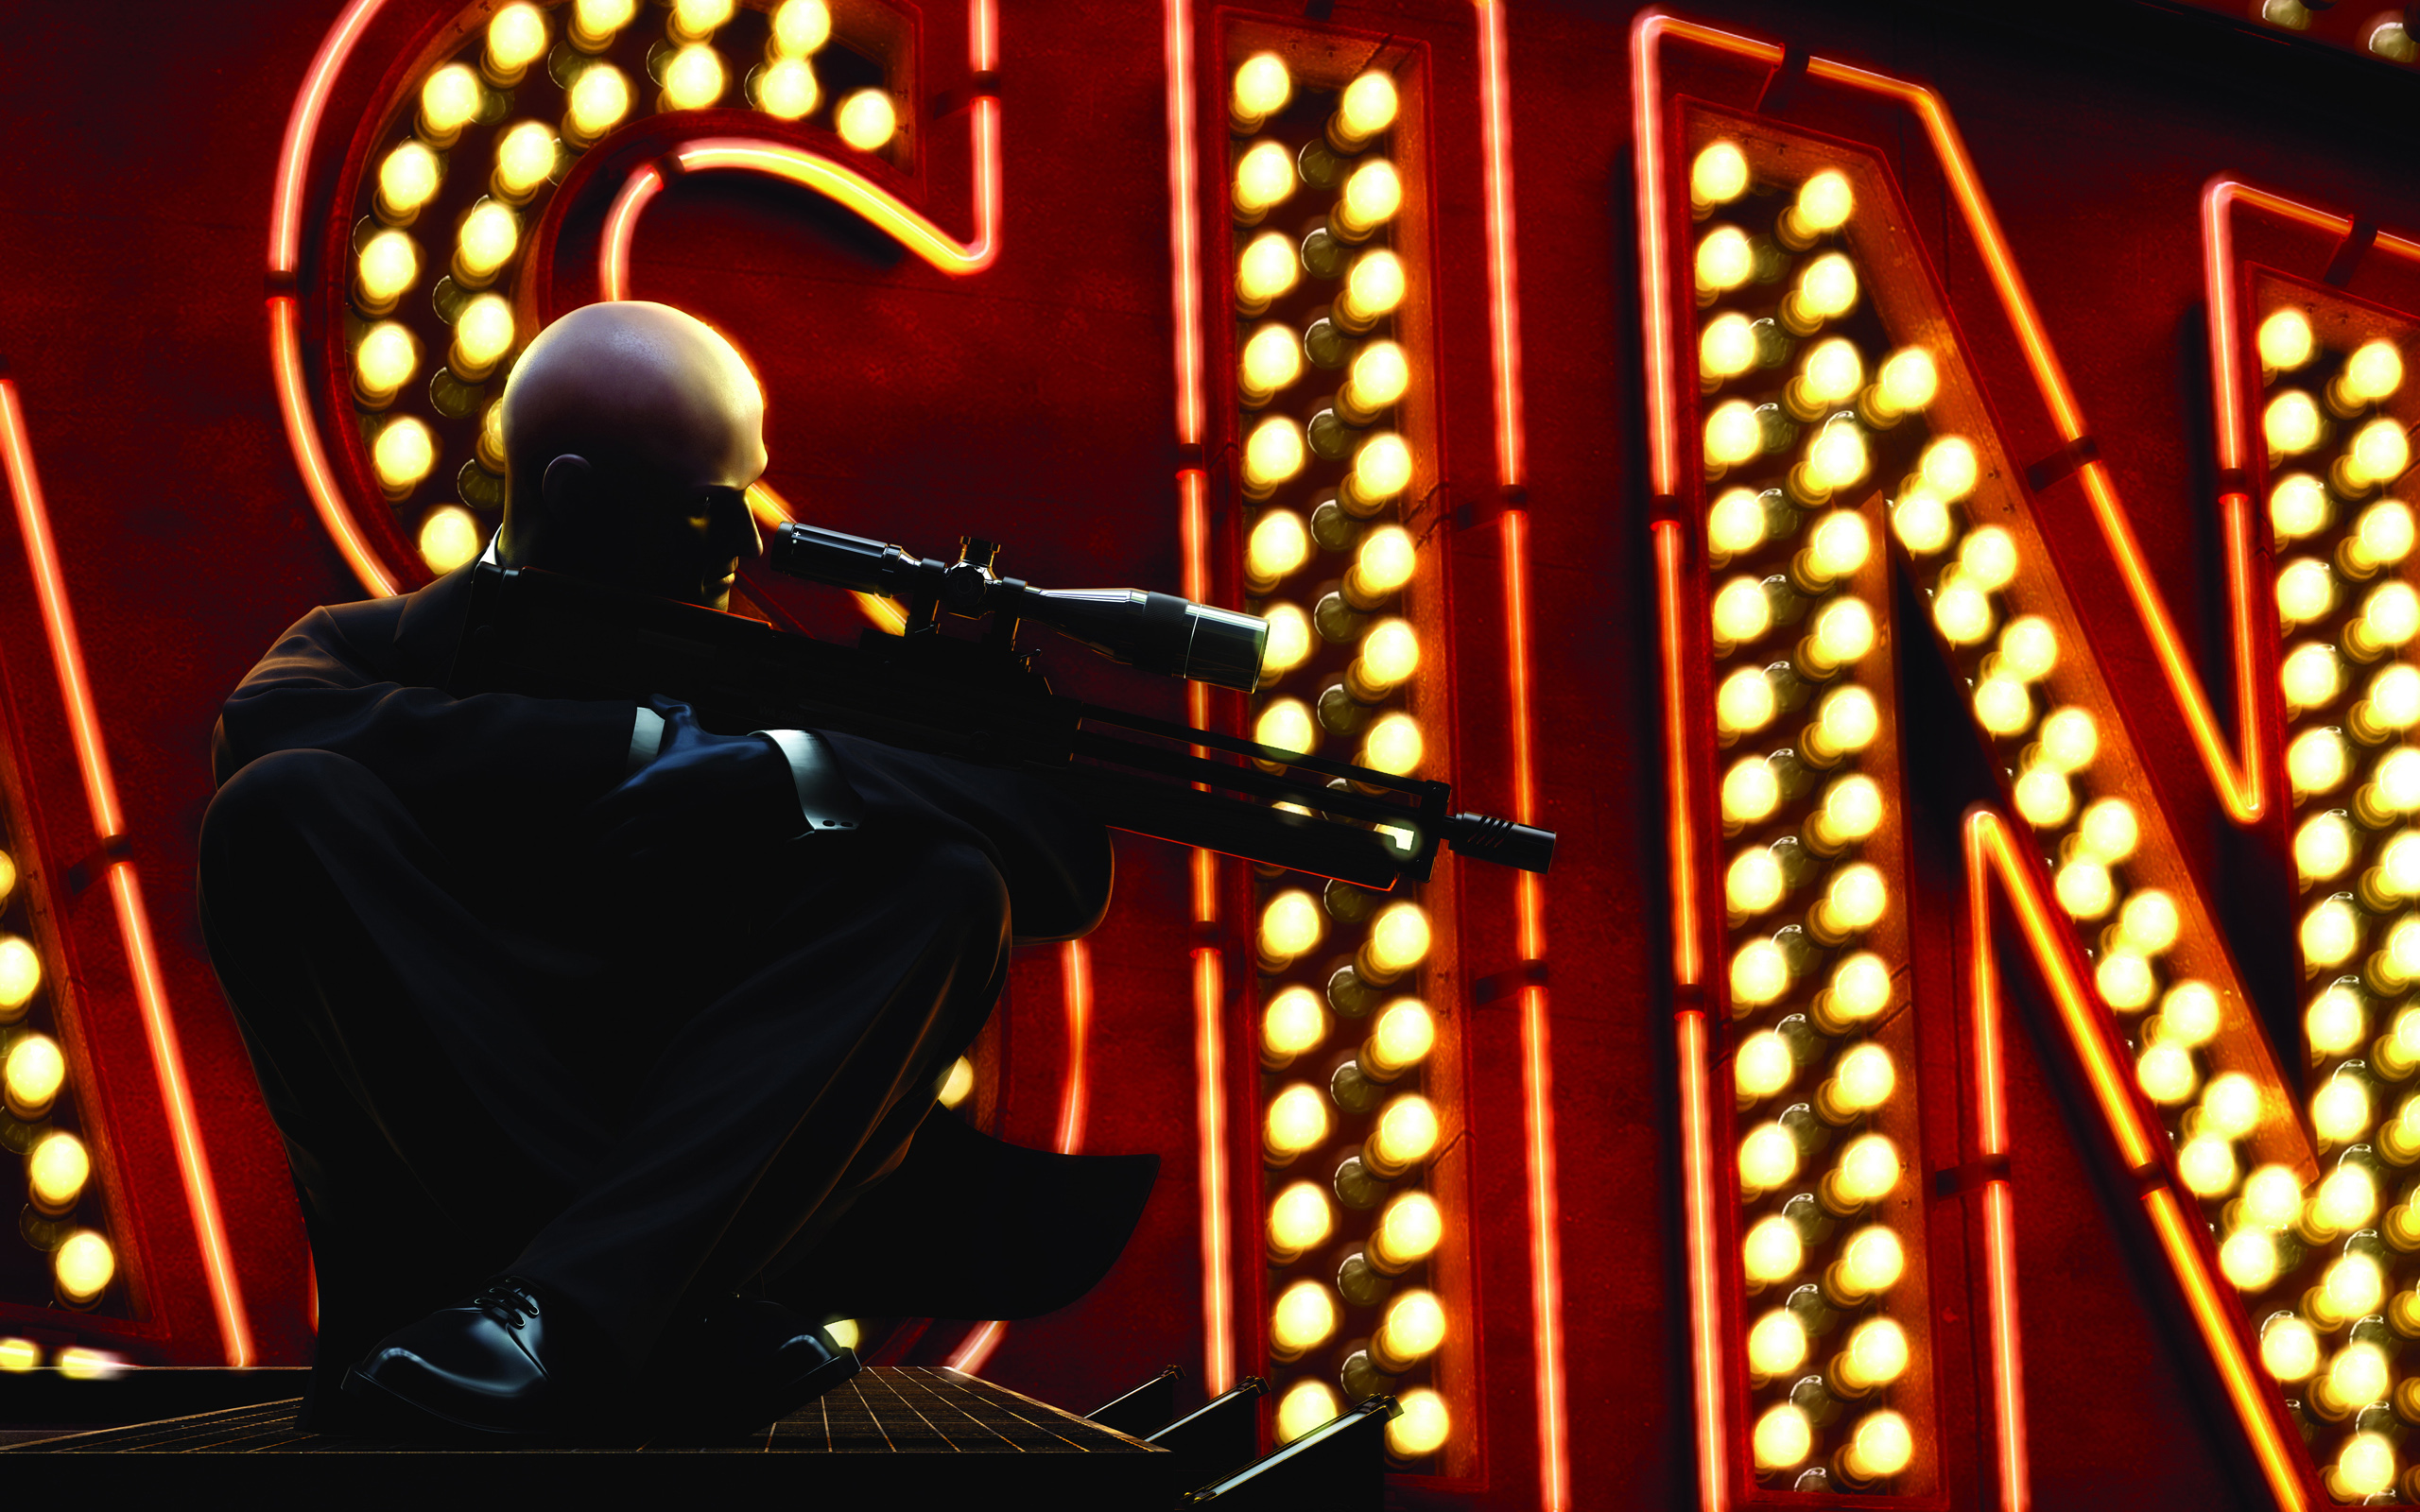 sniper wallpaper hd hitman - photo #23